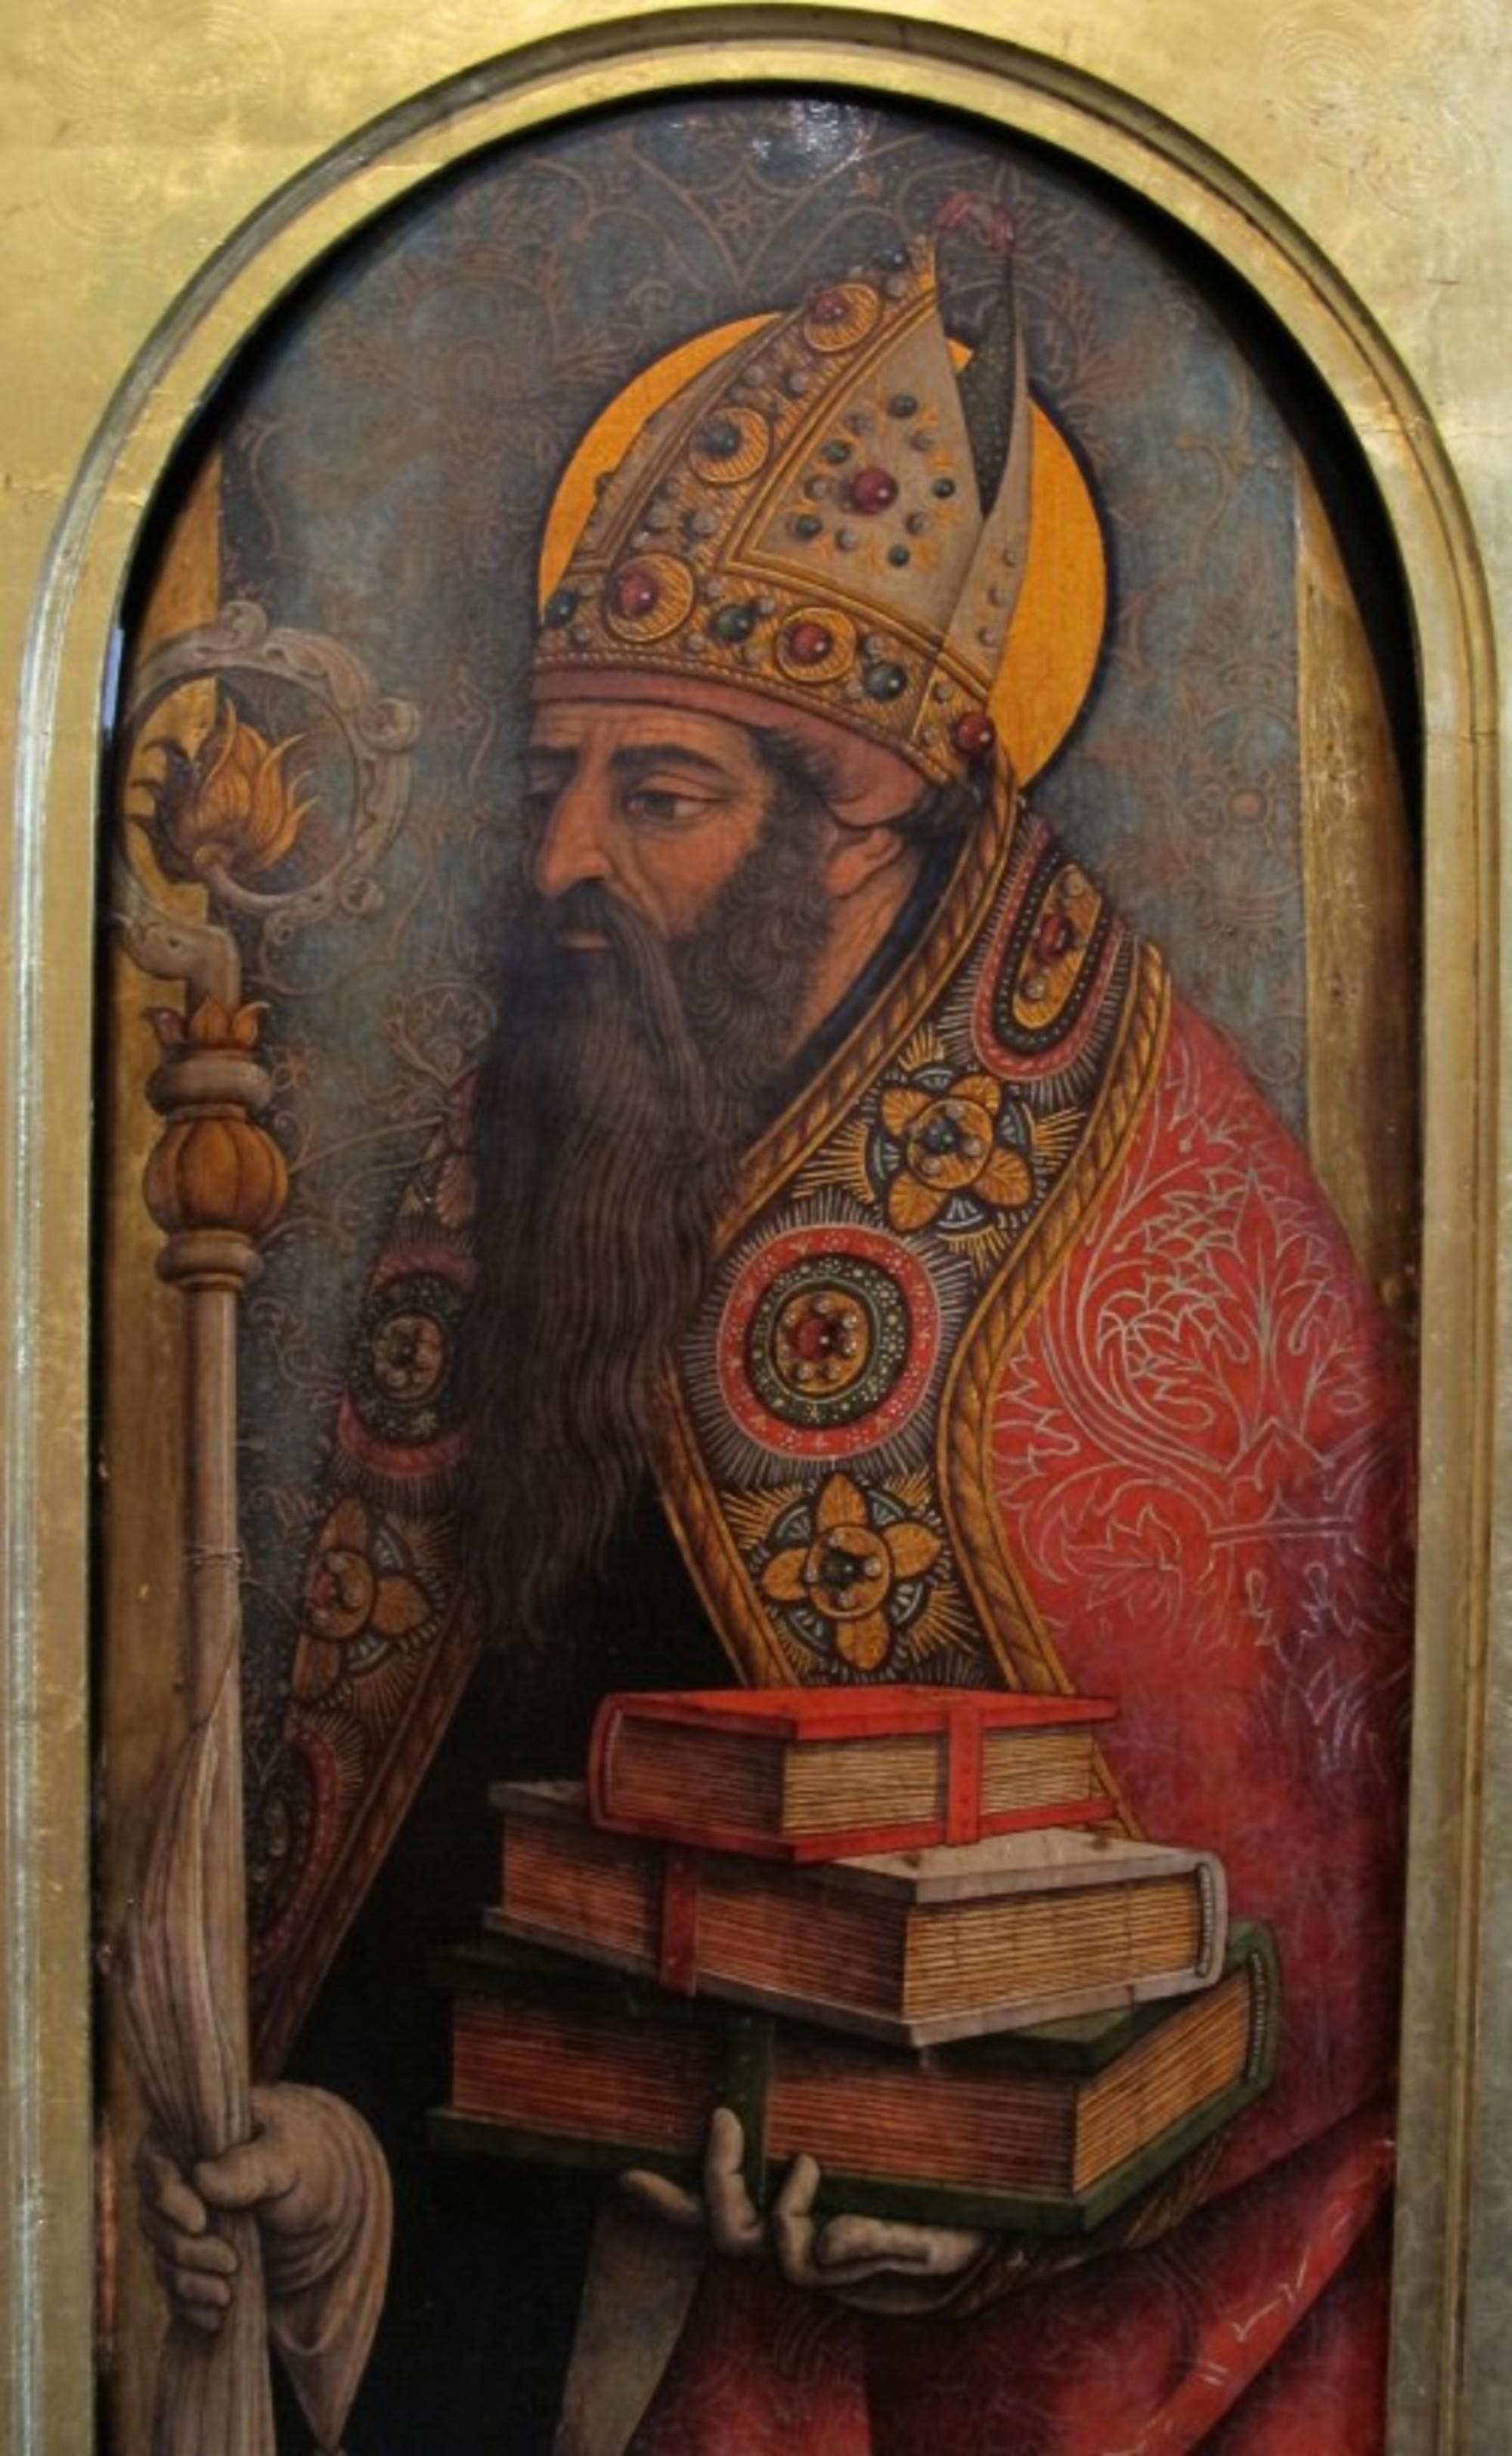 Carlo-crivelli-santagostino-1487-88-ca.-02.jpg